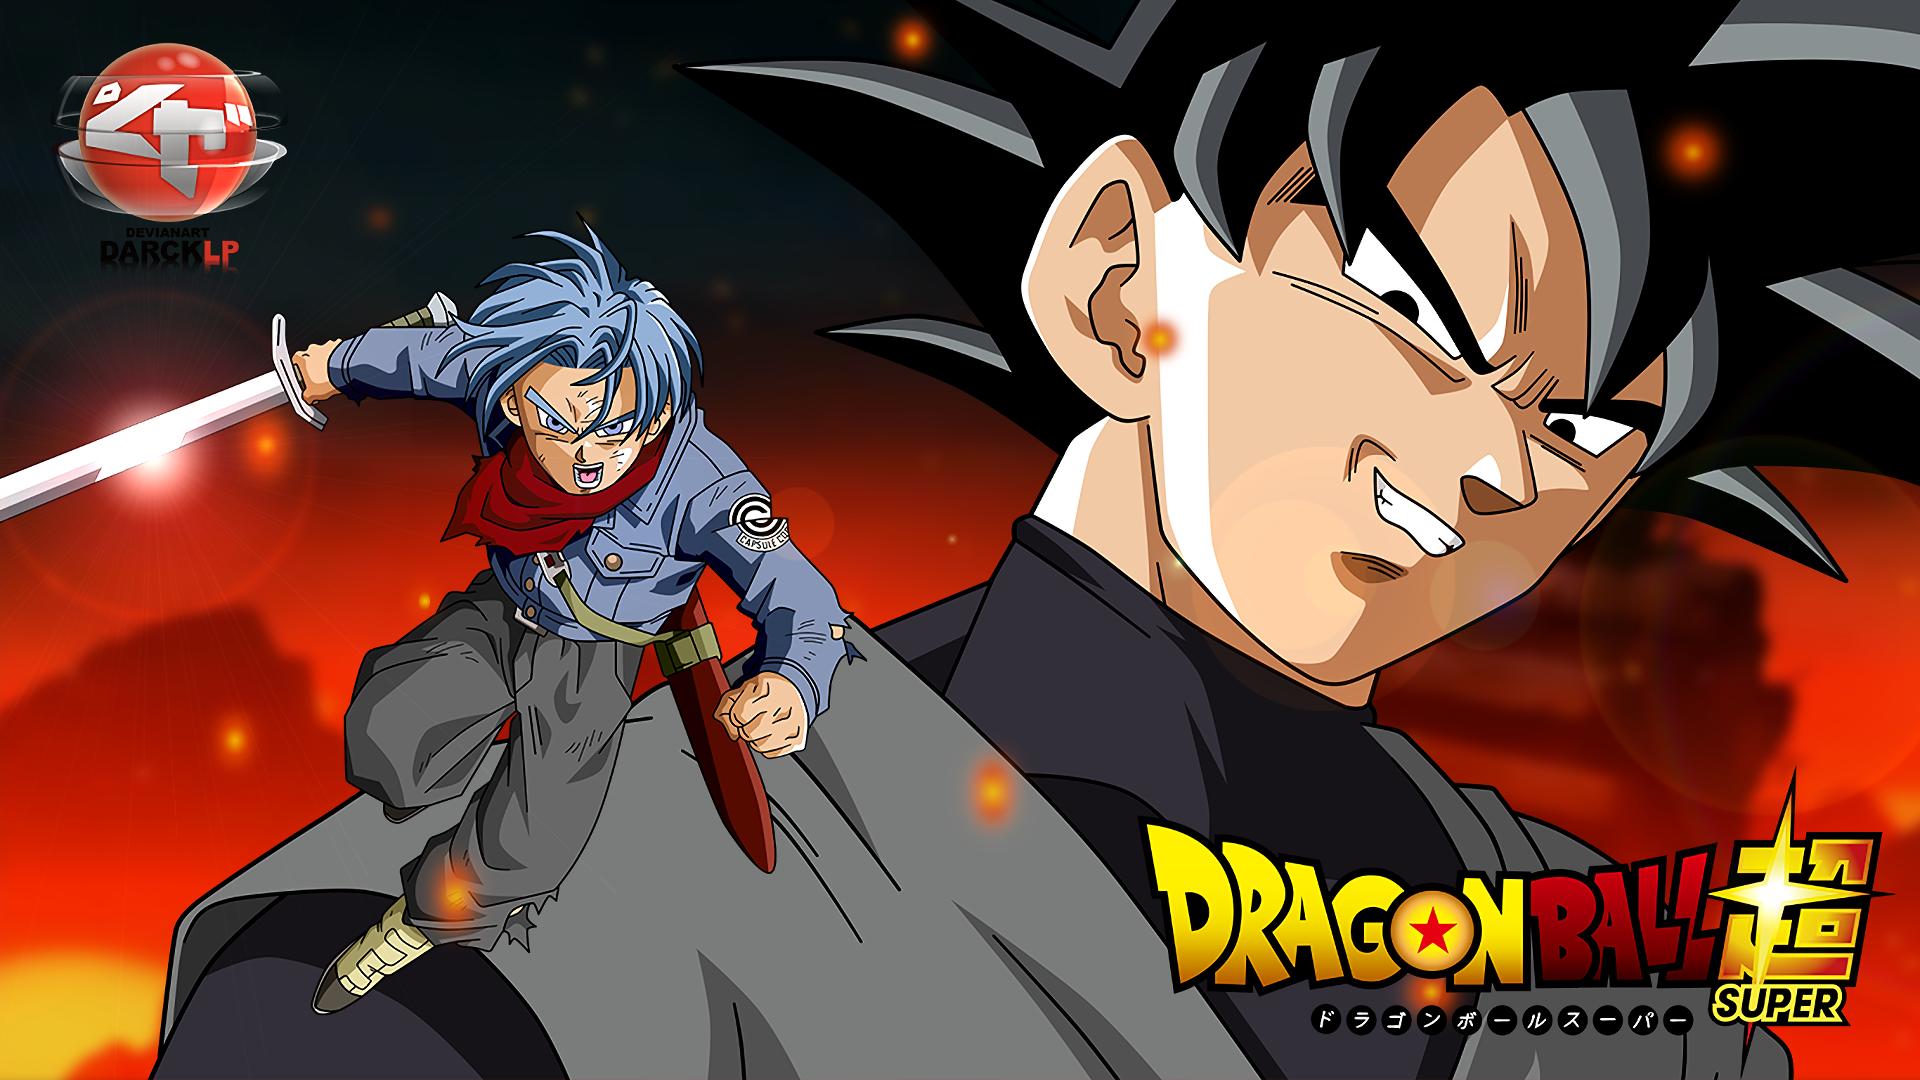 Dragon Ball Super Fond d'écran HD | Arrière-Plan | 1920x1080 | ID:749962 - Wallpaper Abyss